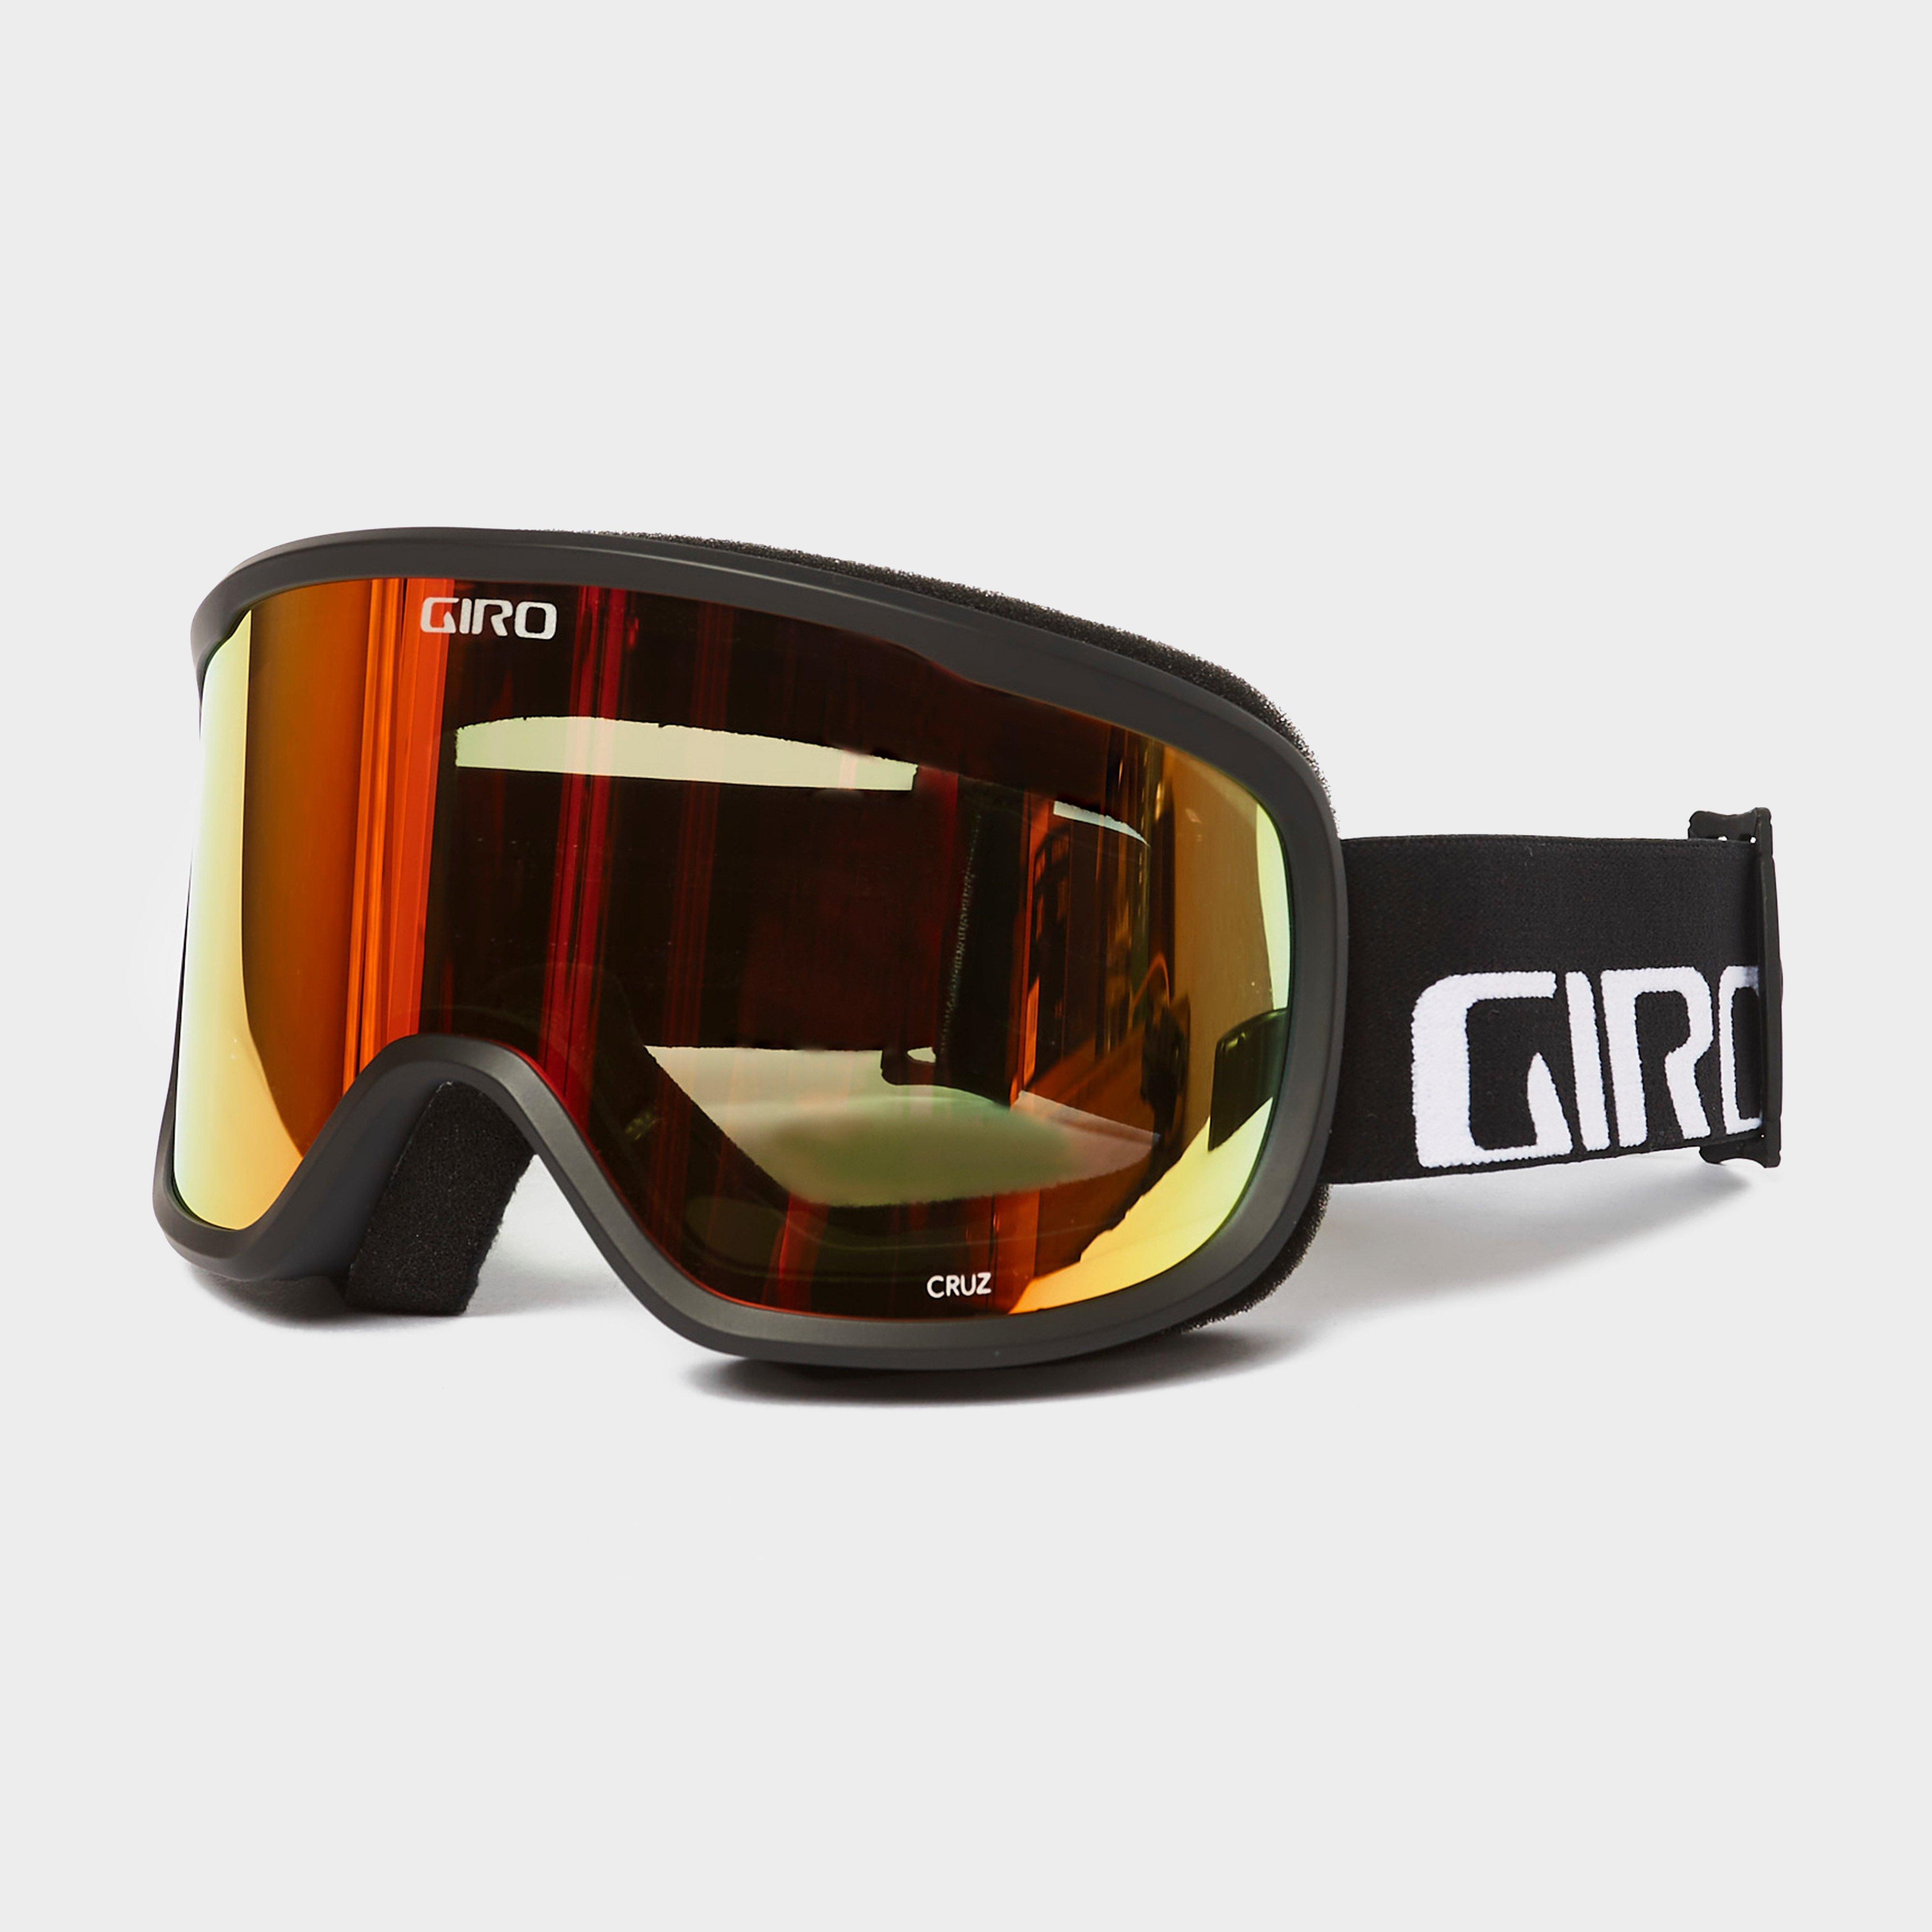 Giro Cruz Goggles - Red/Red, Red